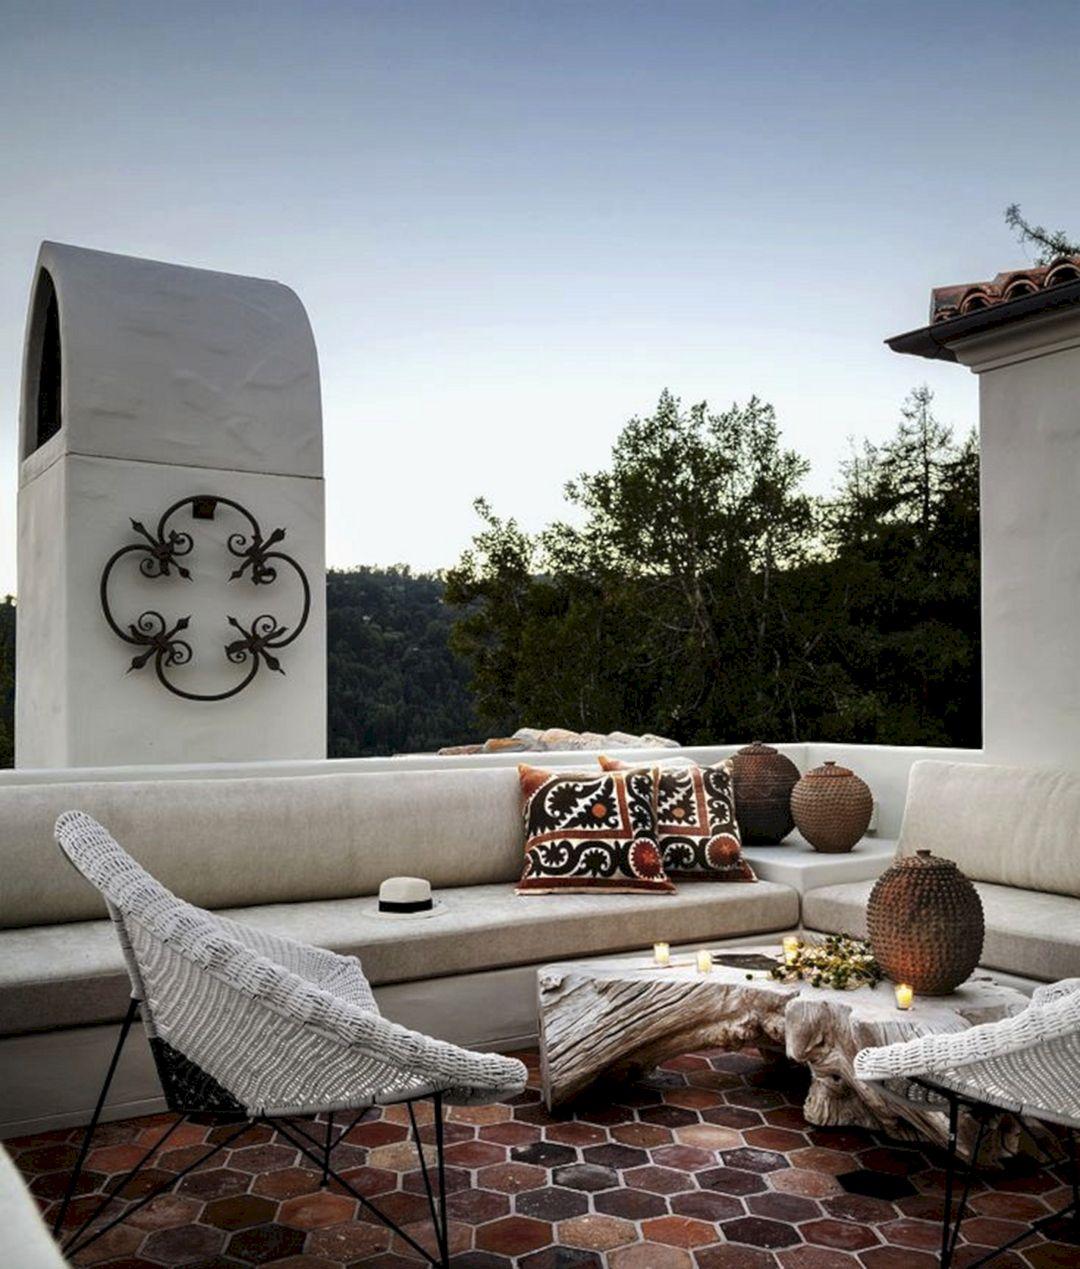 Spanish Outdoor Bedroom Furniture Design Ideas